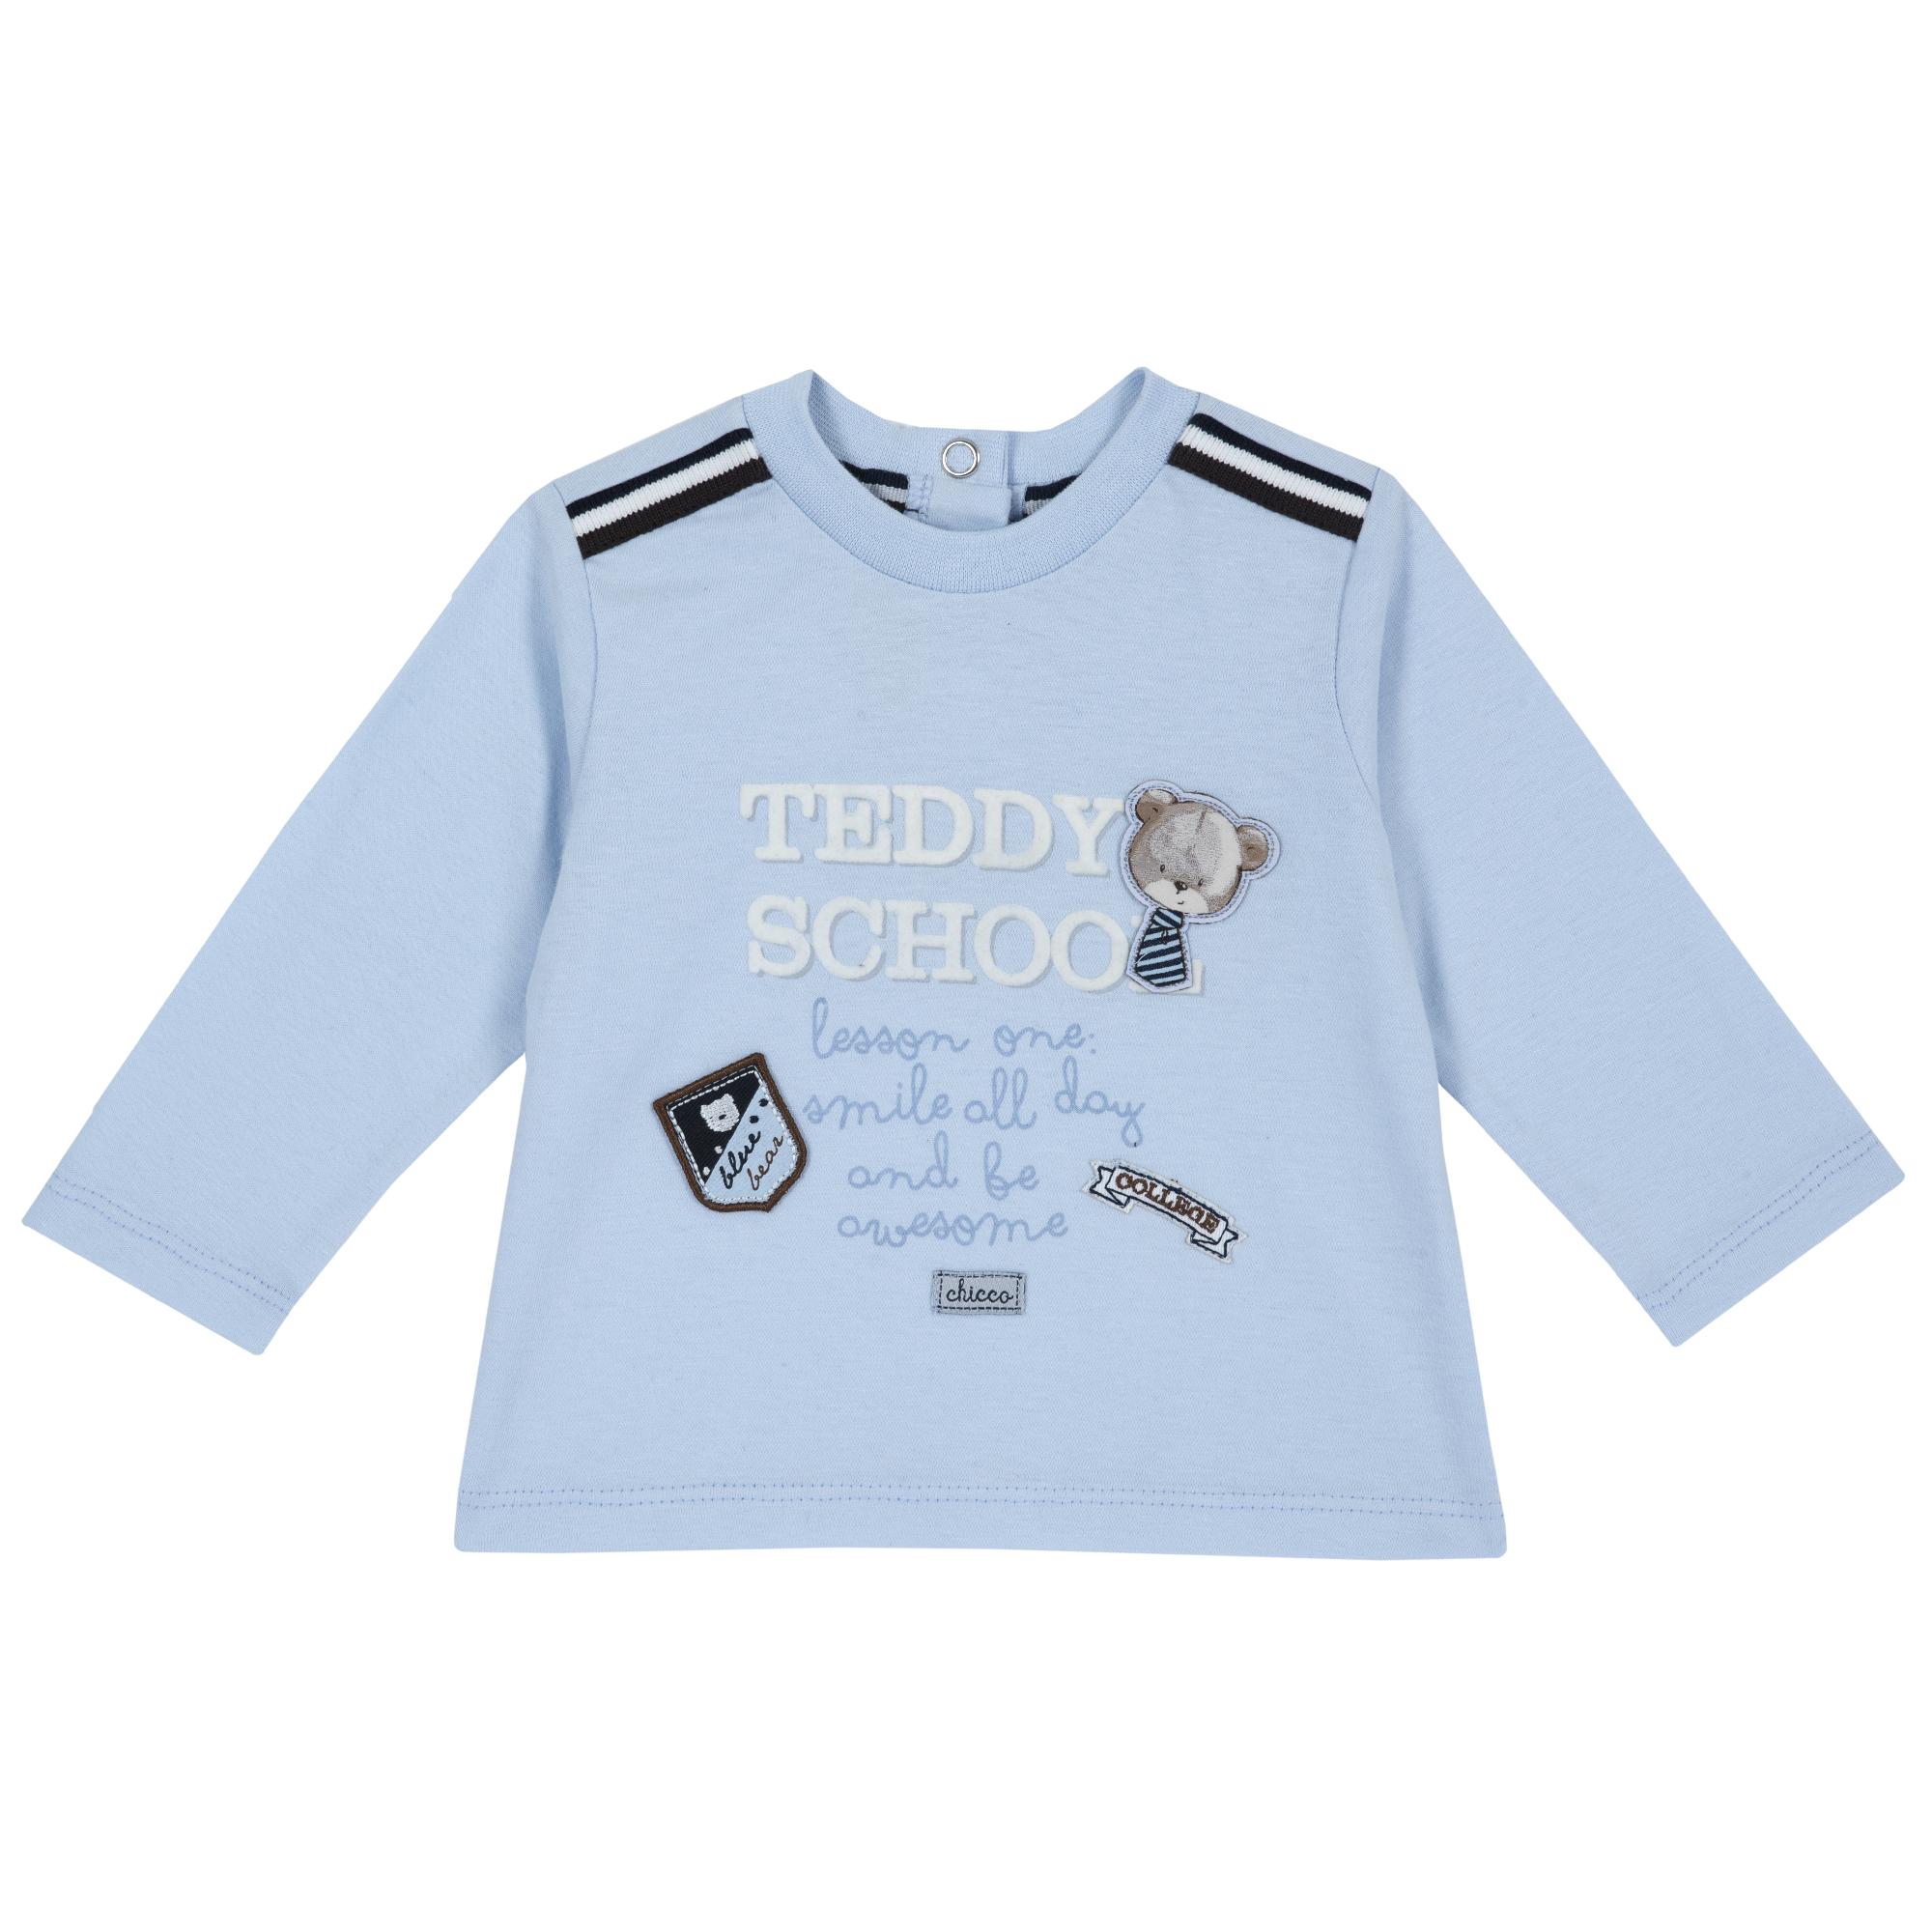 Tricou copii Chicco, maneca lunga, aplicatii cu ursuleti, albastru, 06780 din categoria Tricouri copii